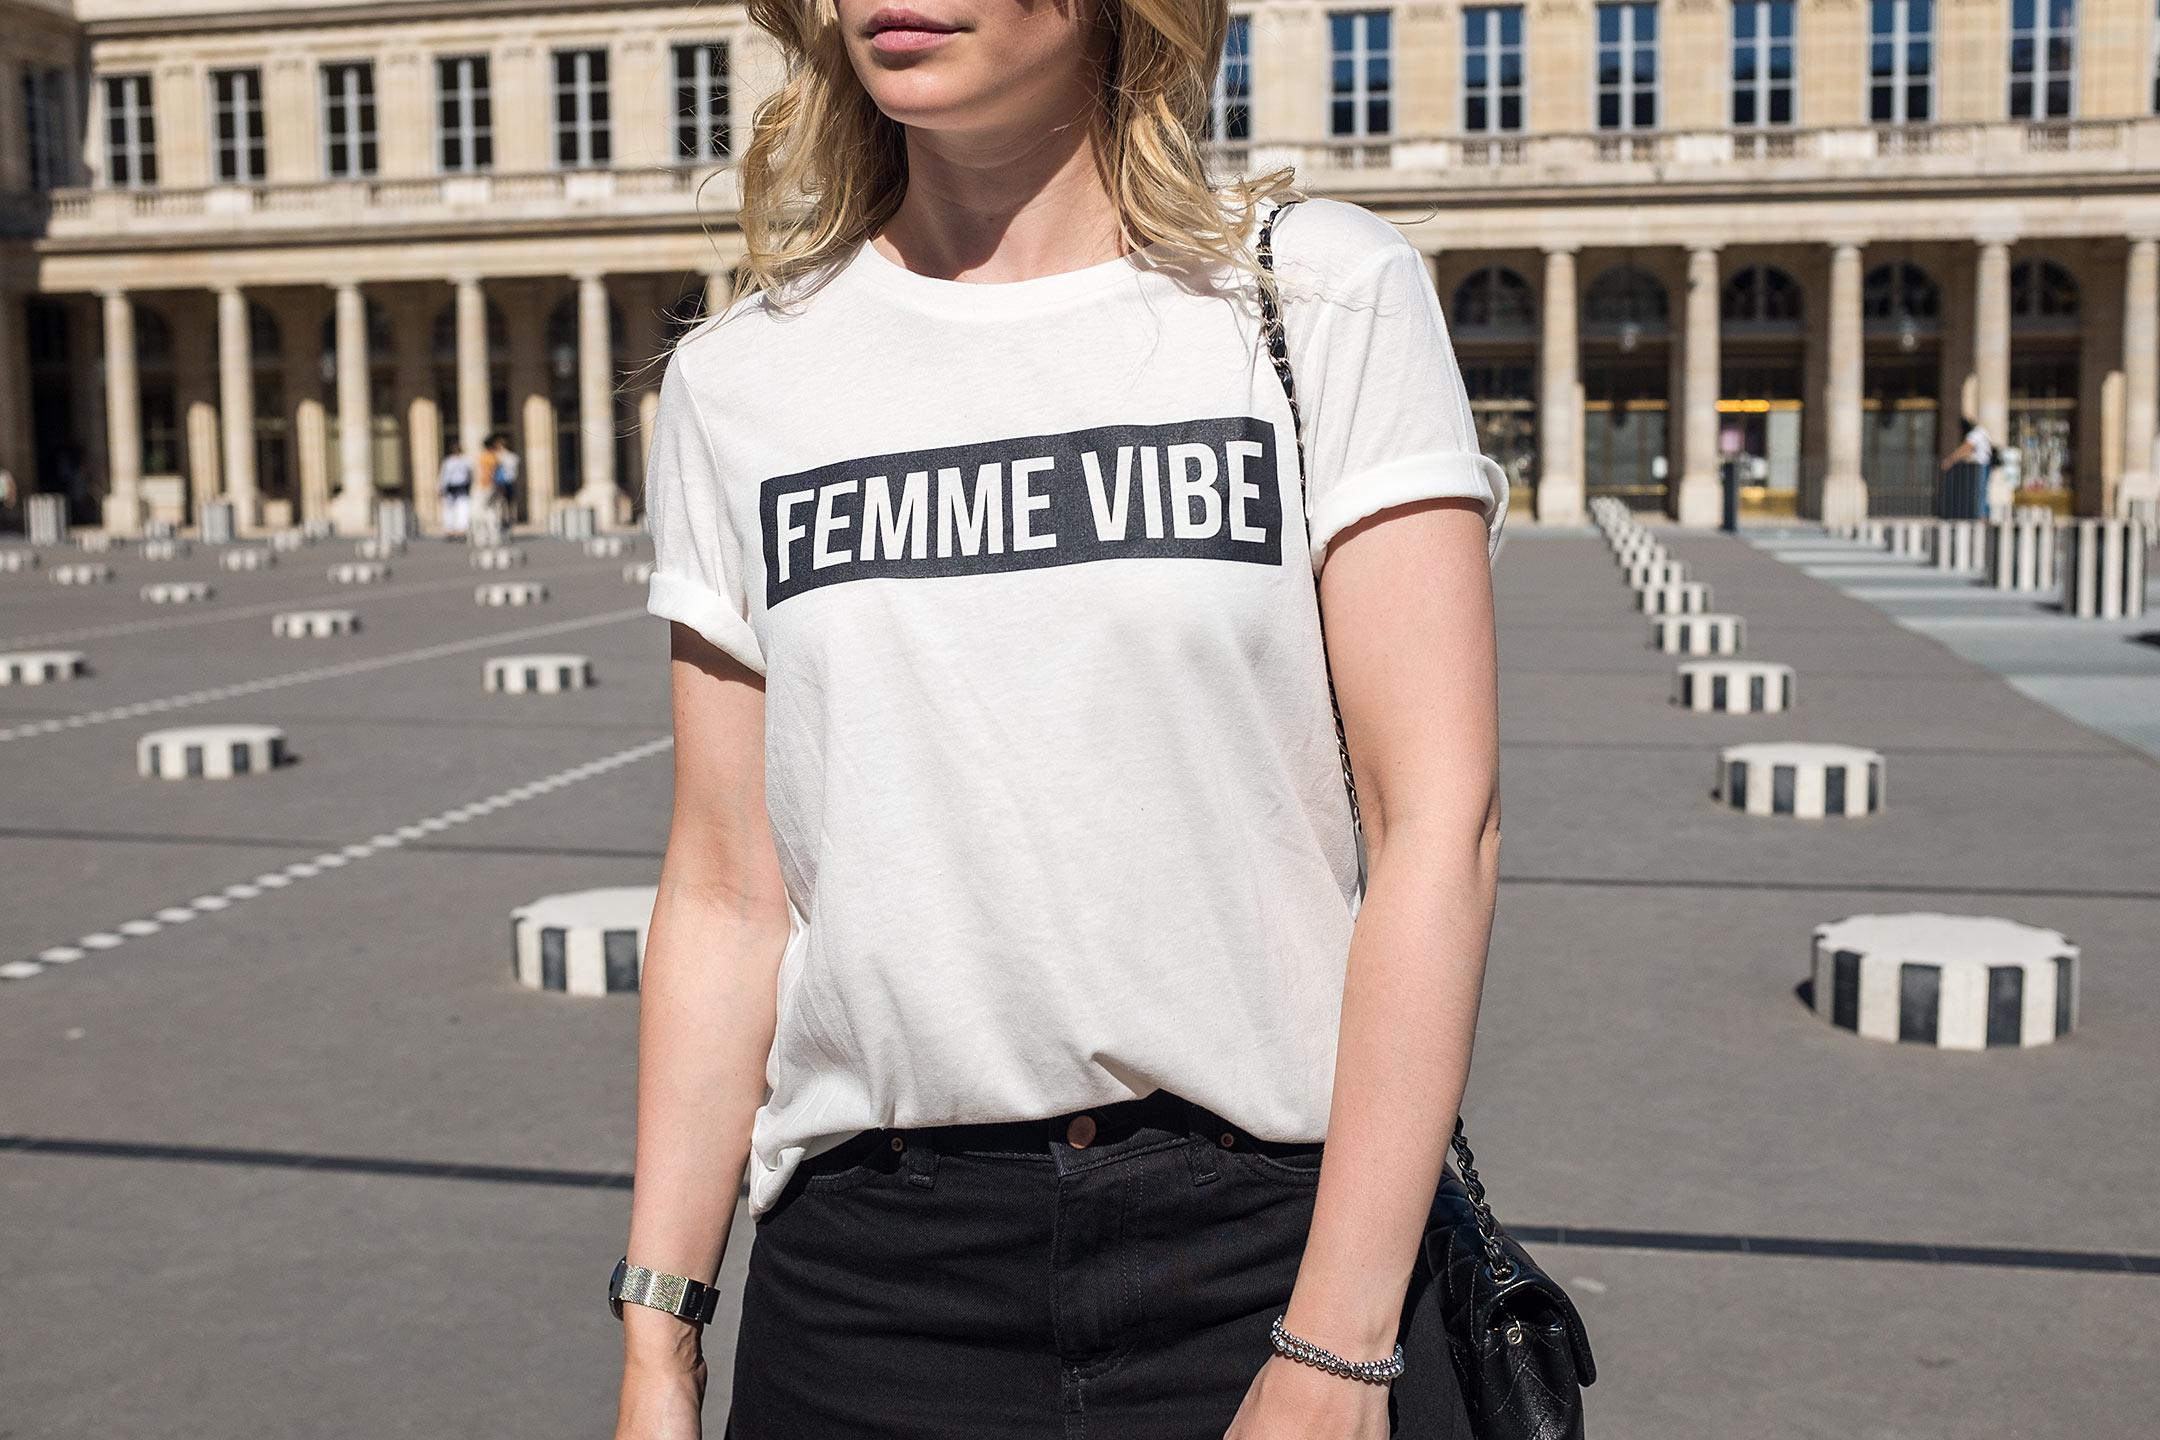 Femme Vibe Shirt Sunnyinga Fashionblog Düsseldorf